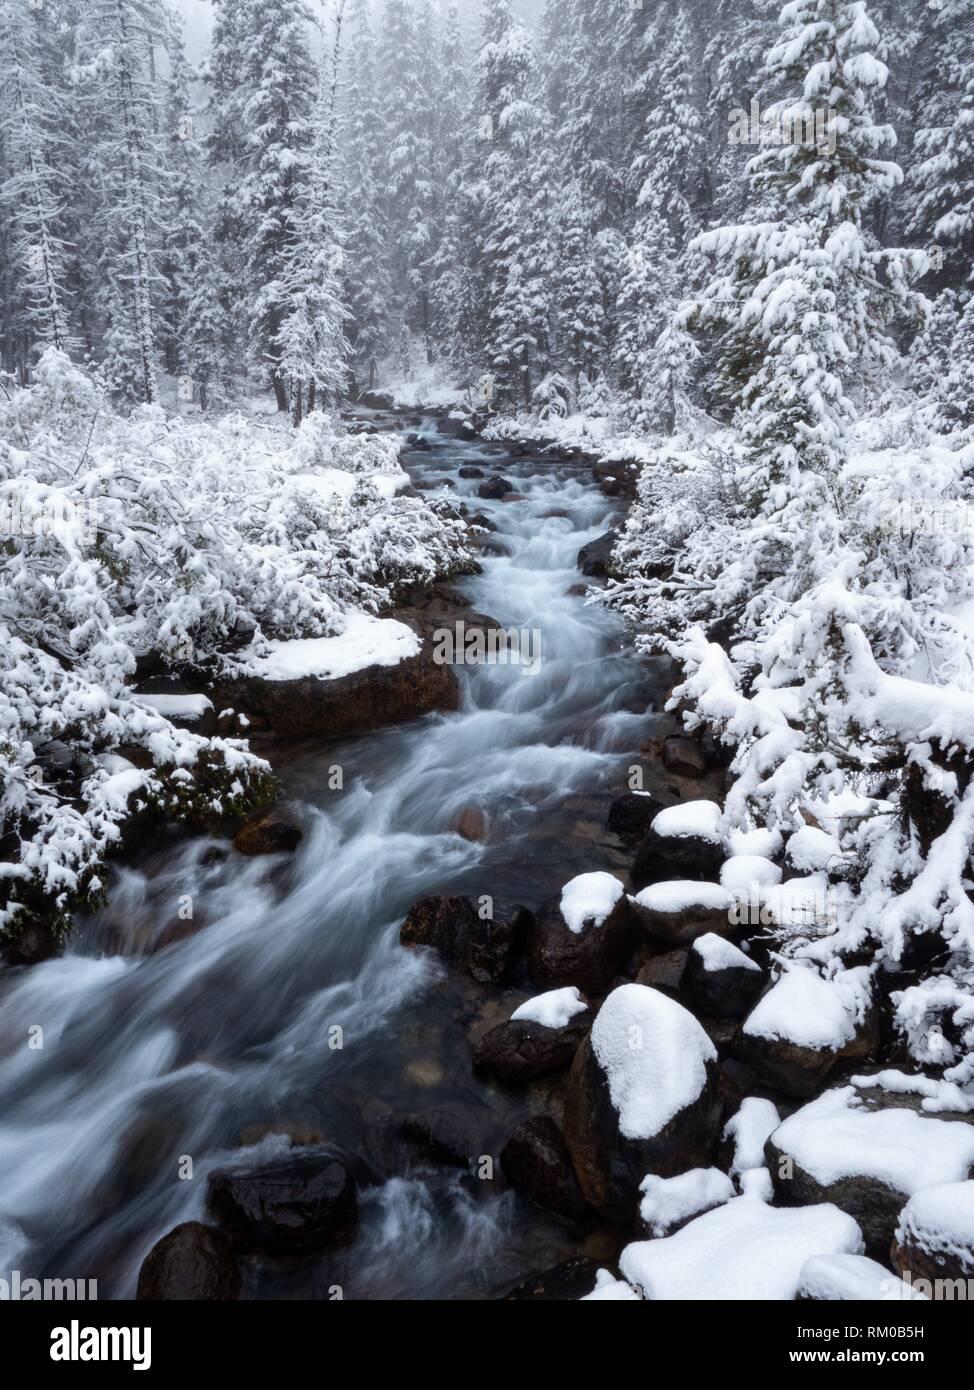 Canadian Rockies. Winter River. - Stock Image